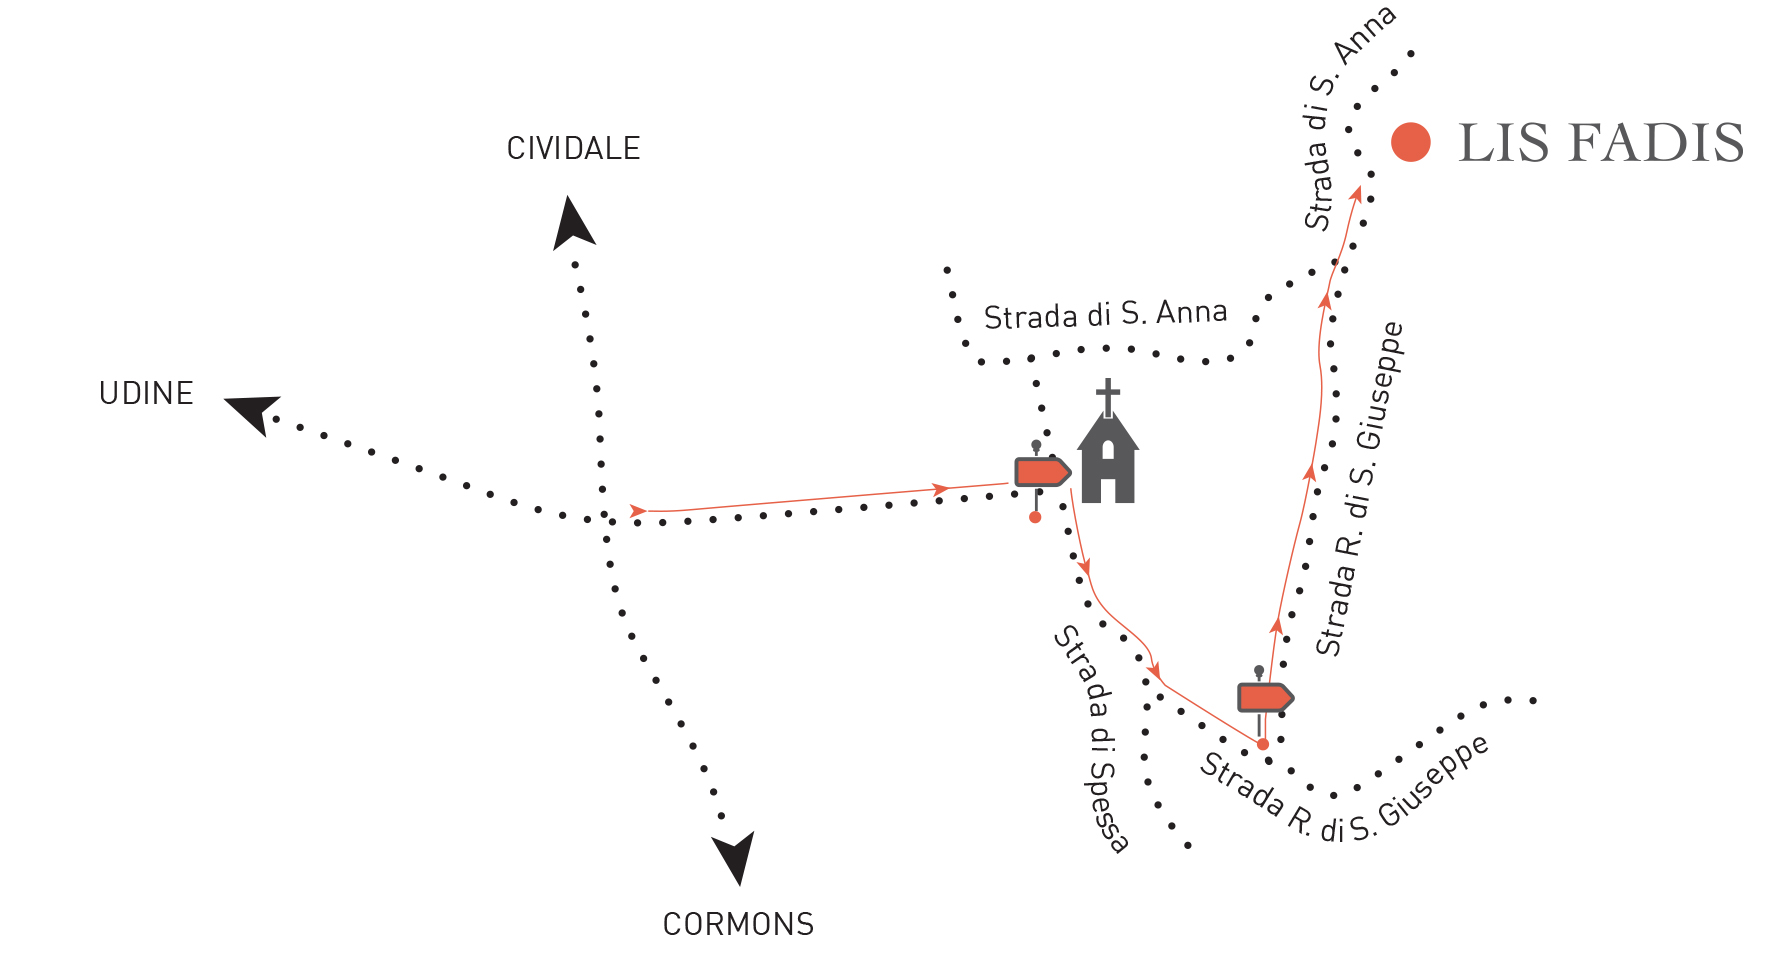 Lis fadis mappa